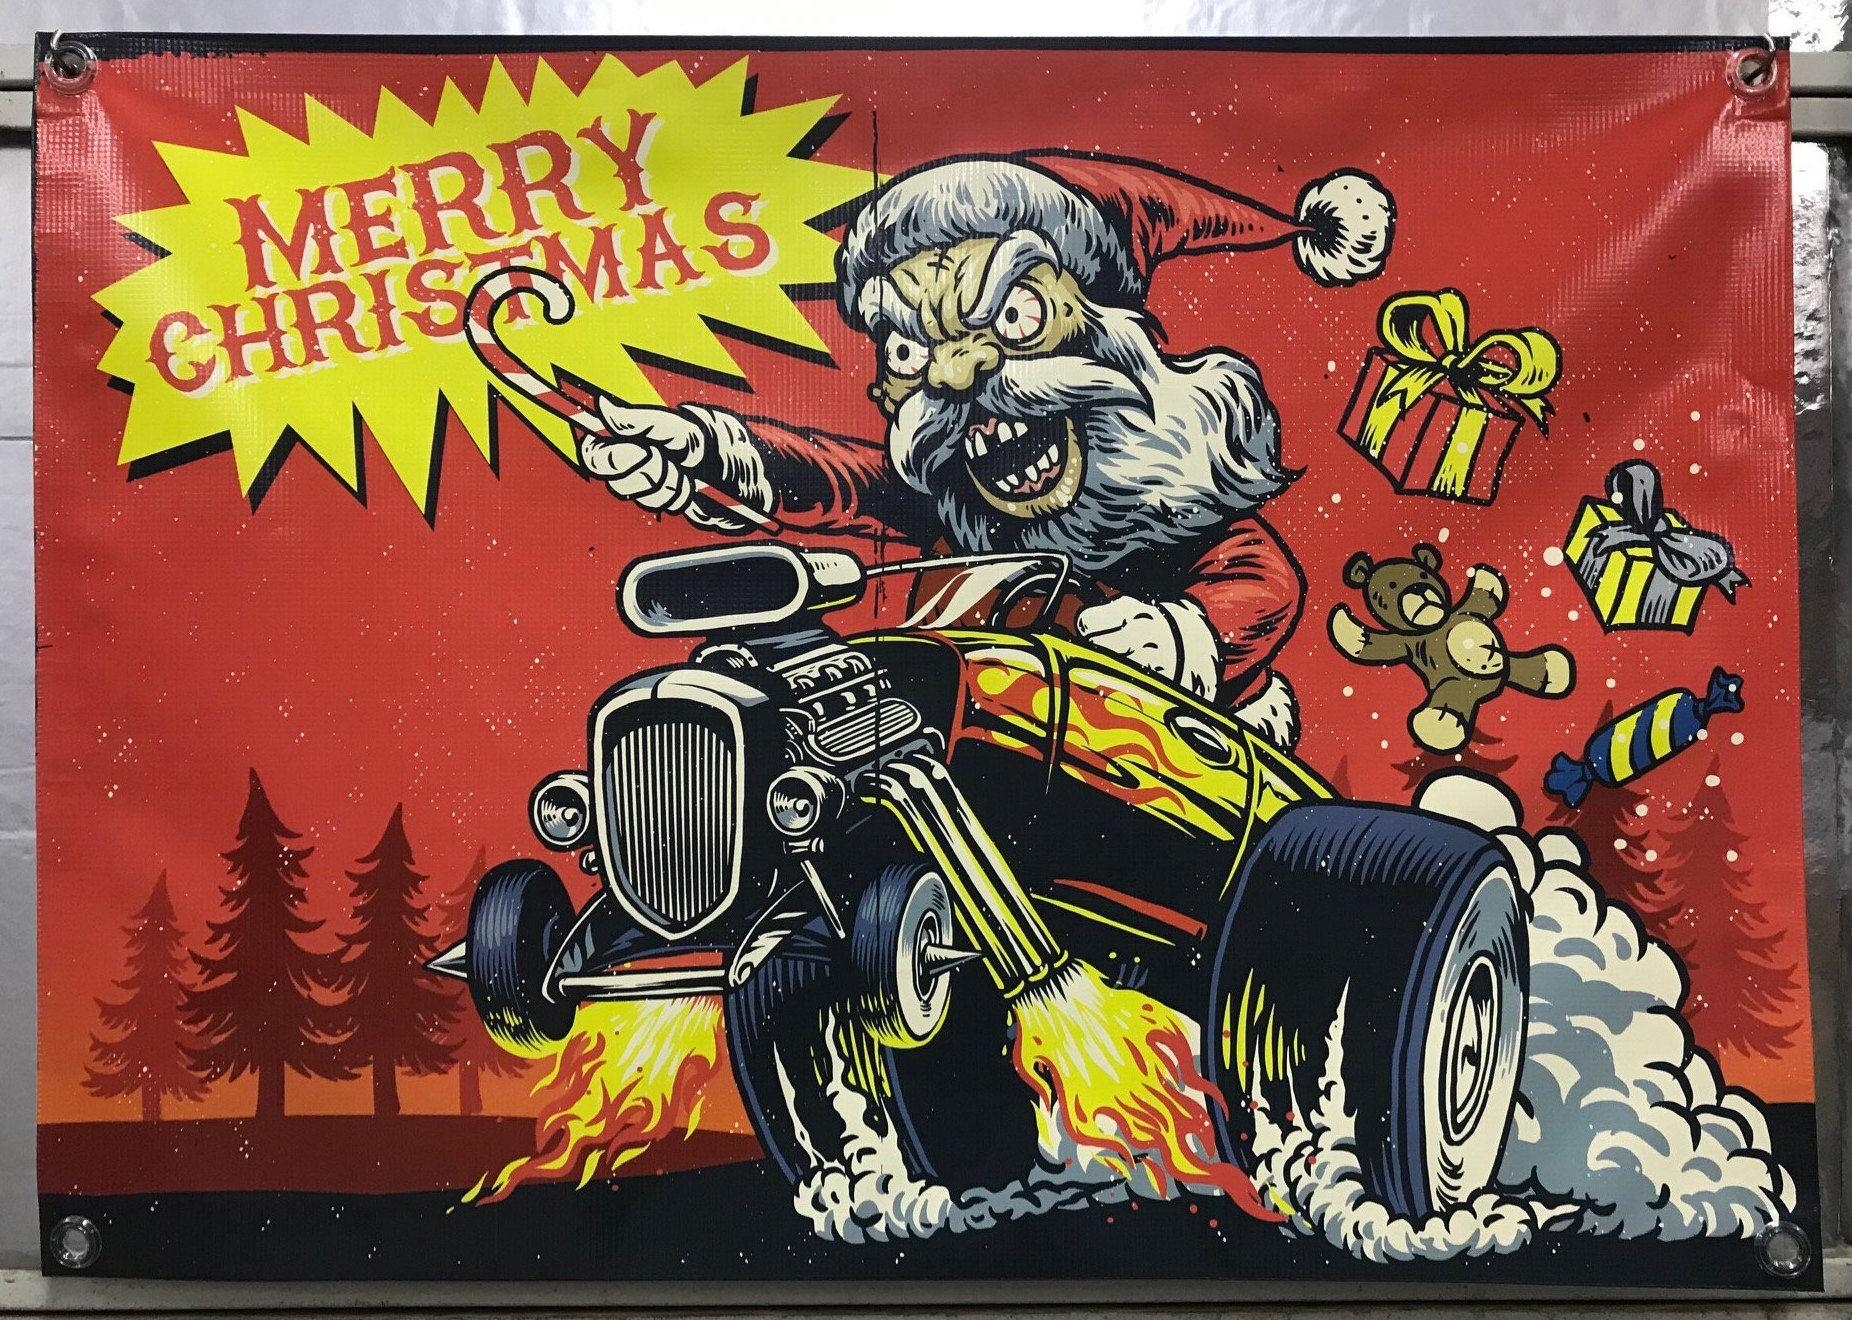 Hot Rod Santa Christmas Banner Merry christmas ya filthy